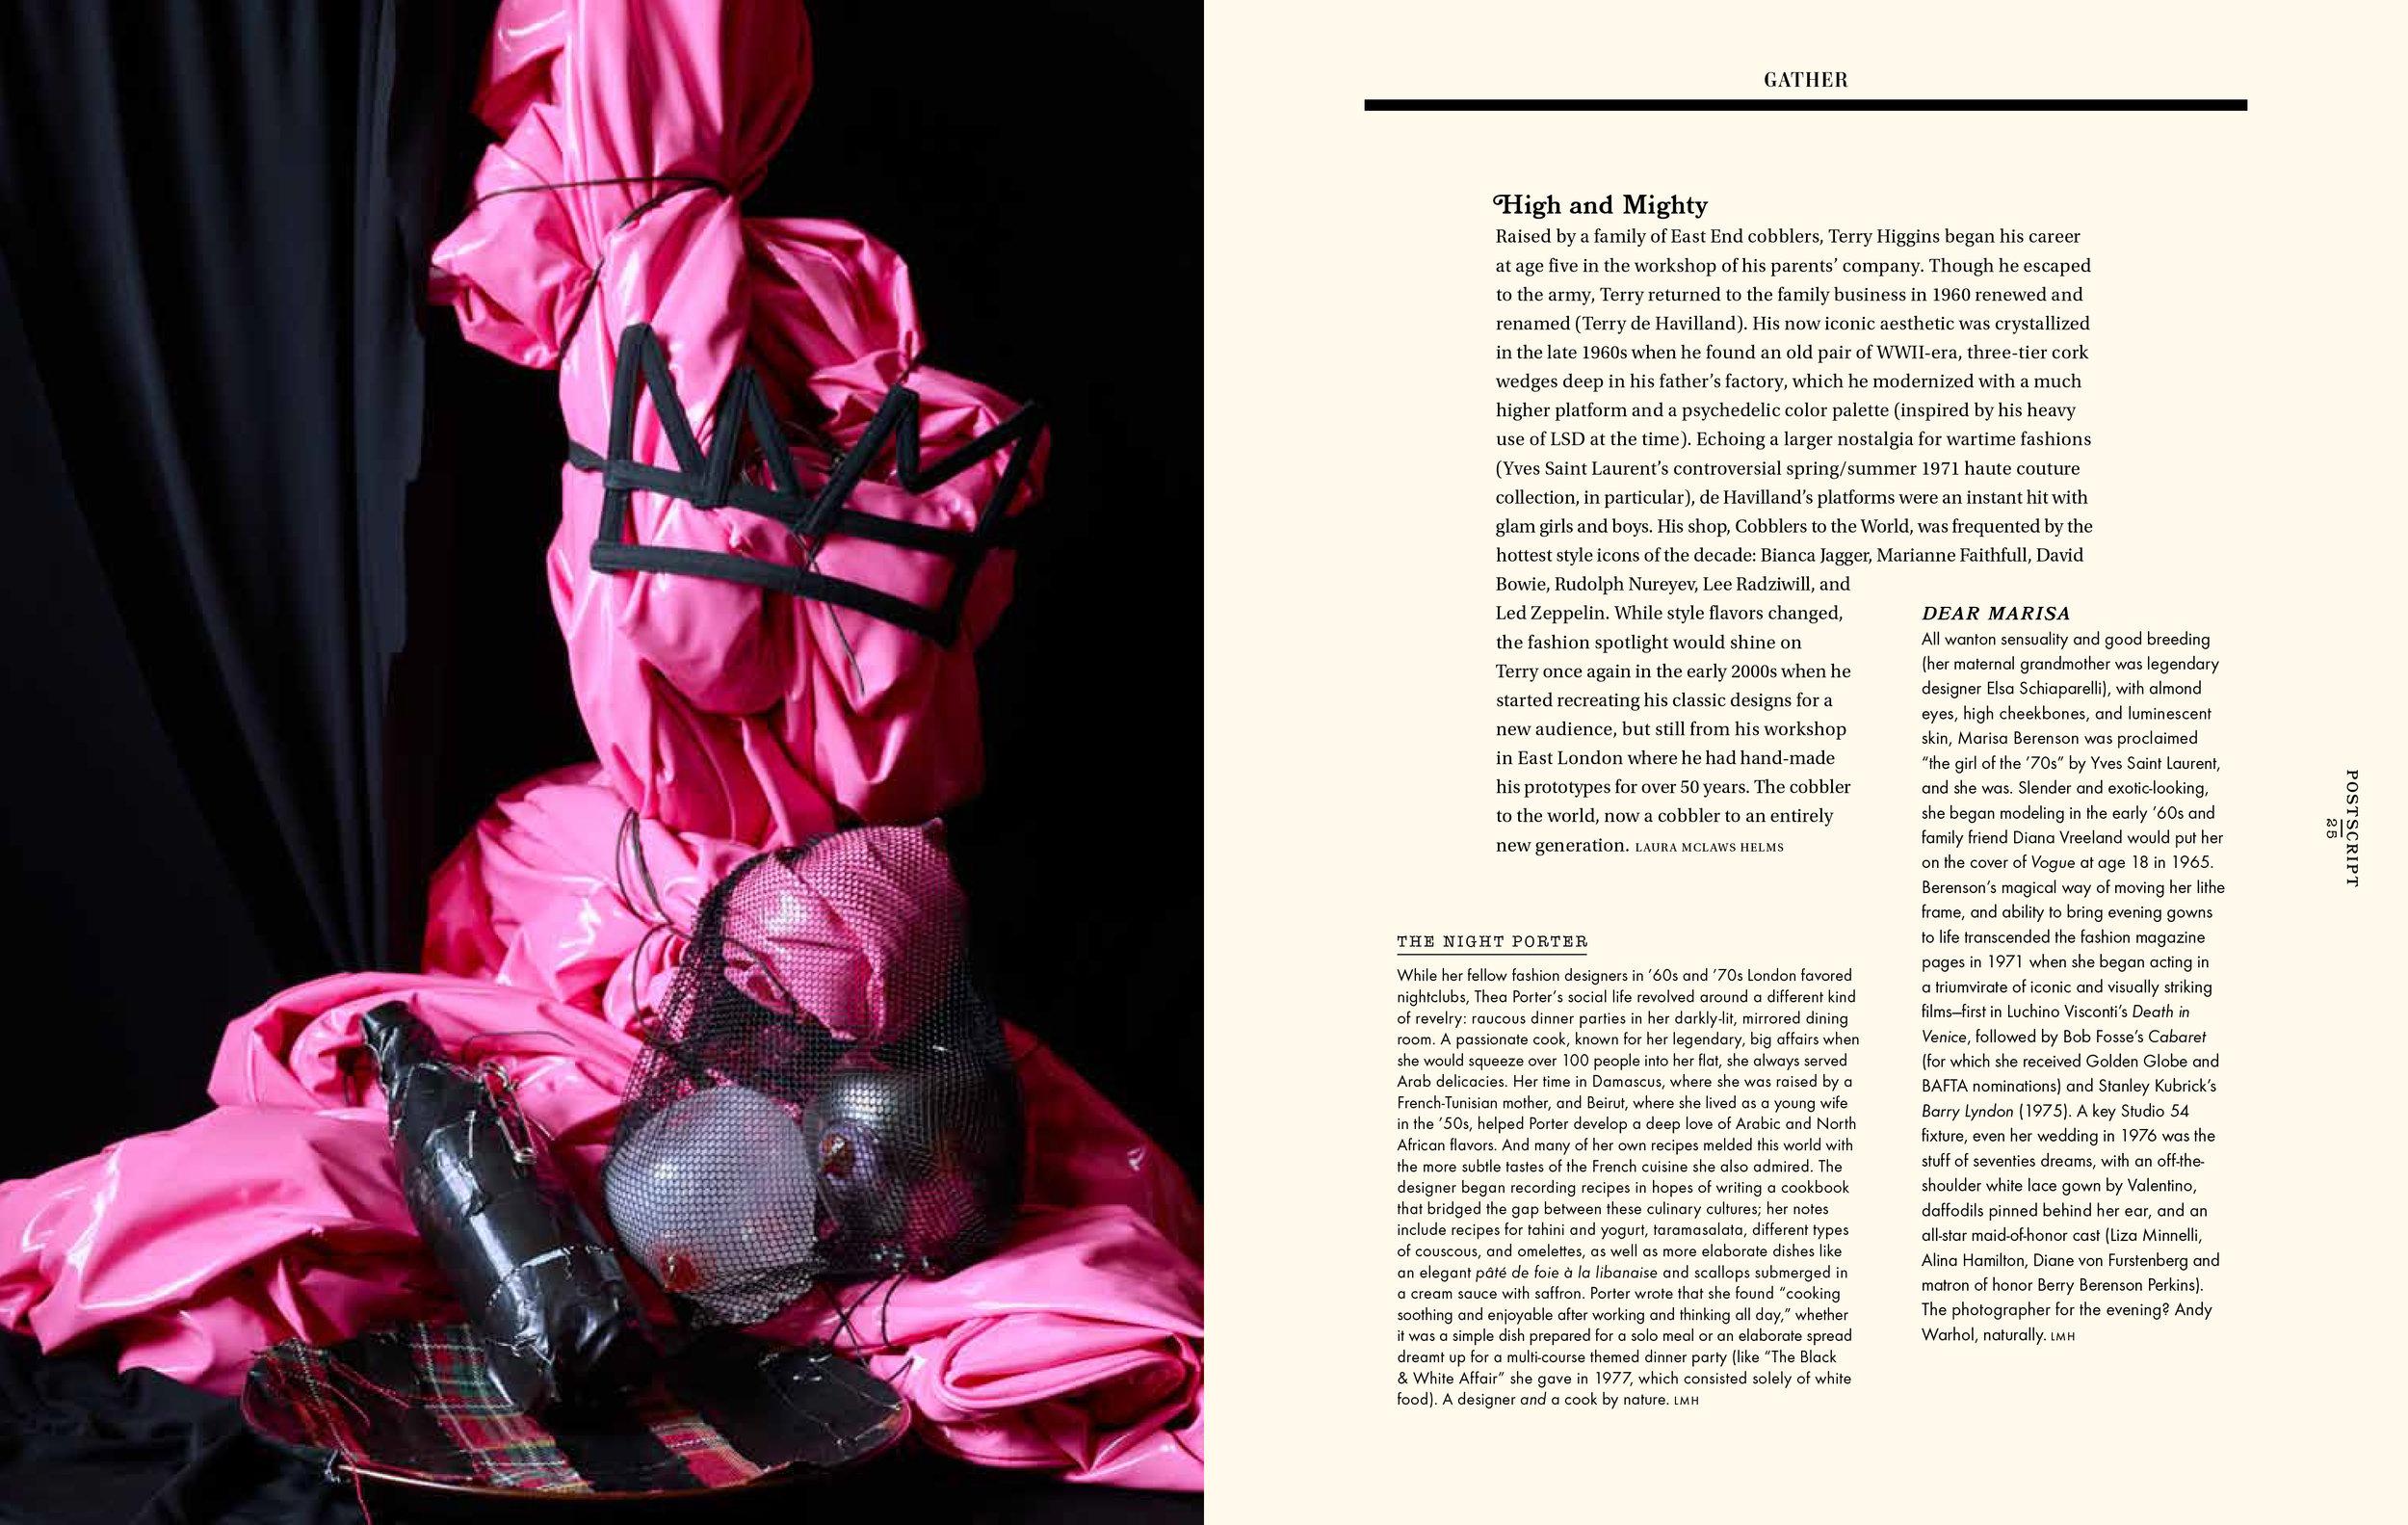 Gather Journal: Pieces on Thea Porter, Marisa Berenson and Terry de Havilland